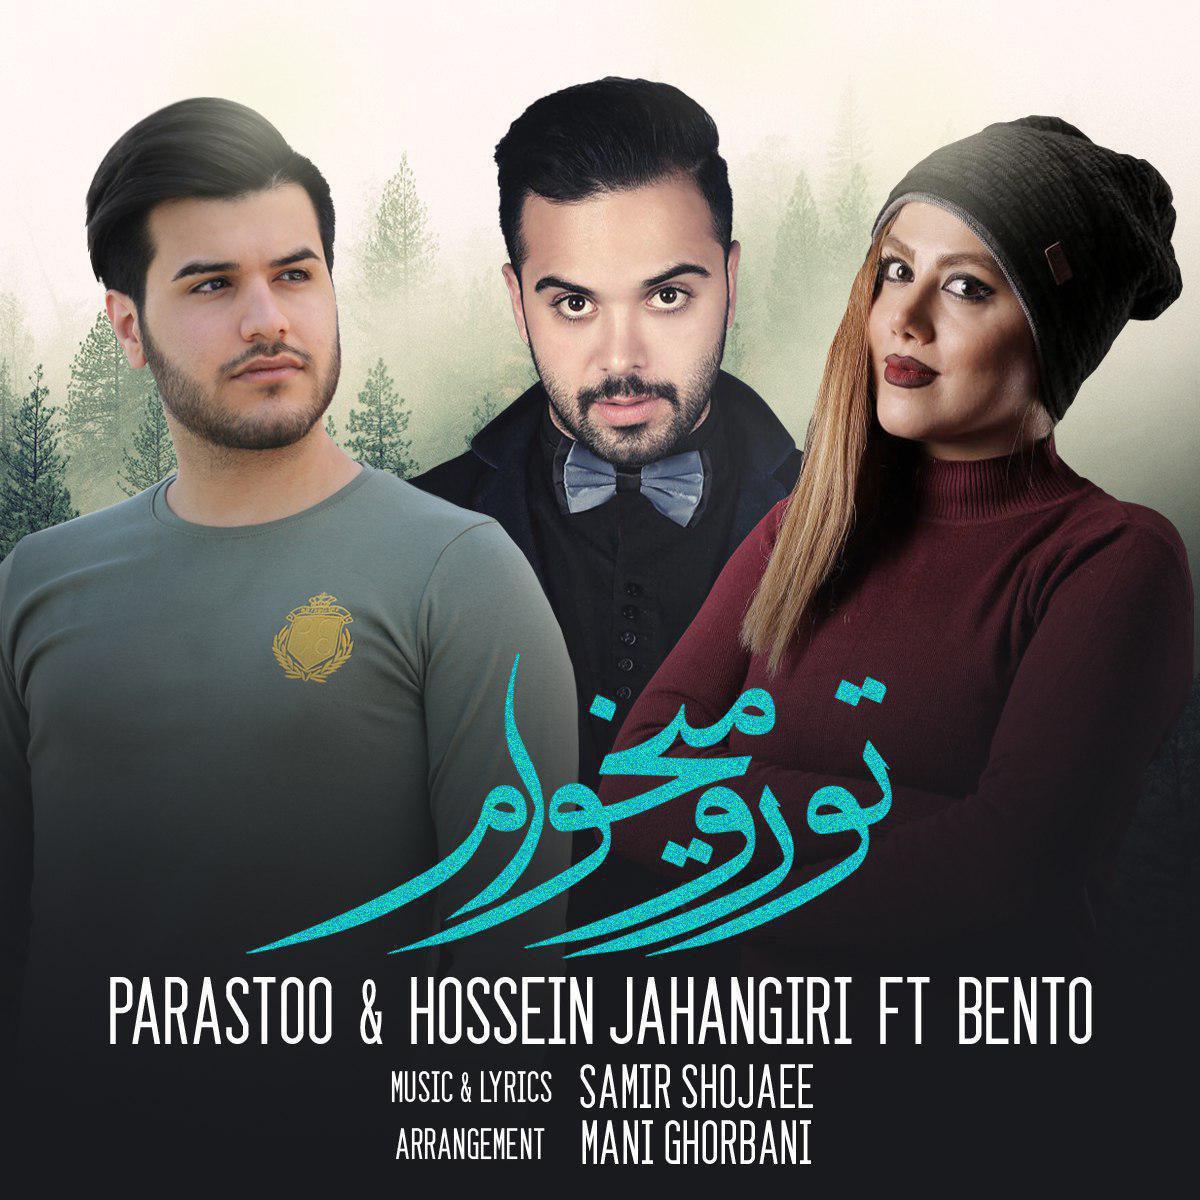 Hossein Jahangiri & Parastoo – Toro Mikham (Ft Bento)